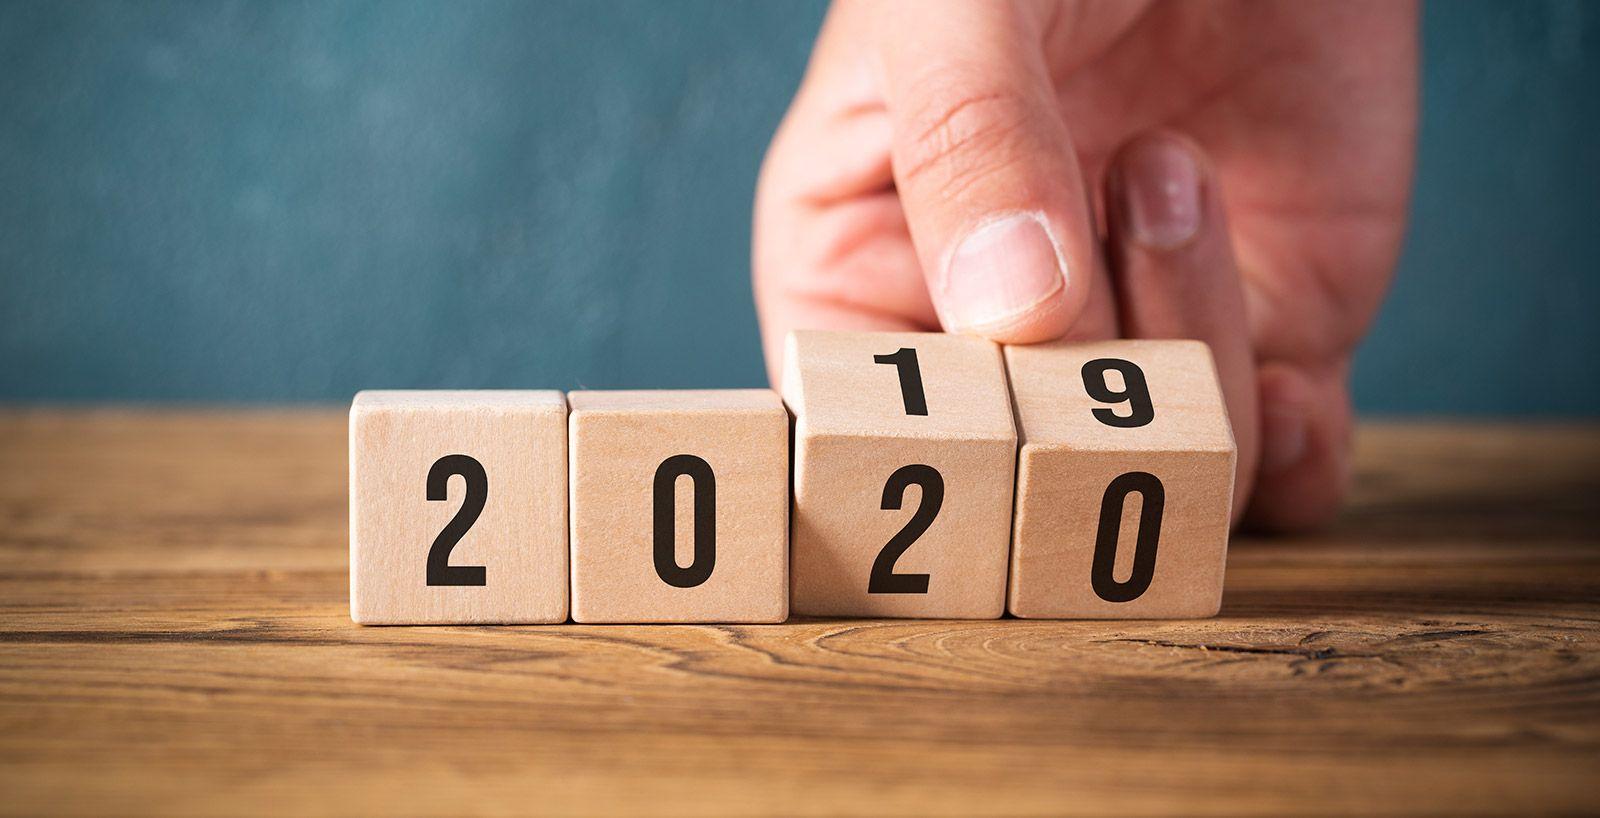 2020.jpg.c1a0e98052078d0c972a0ccde129d4e5.jpg